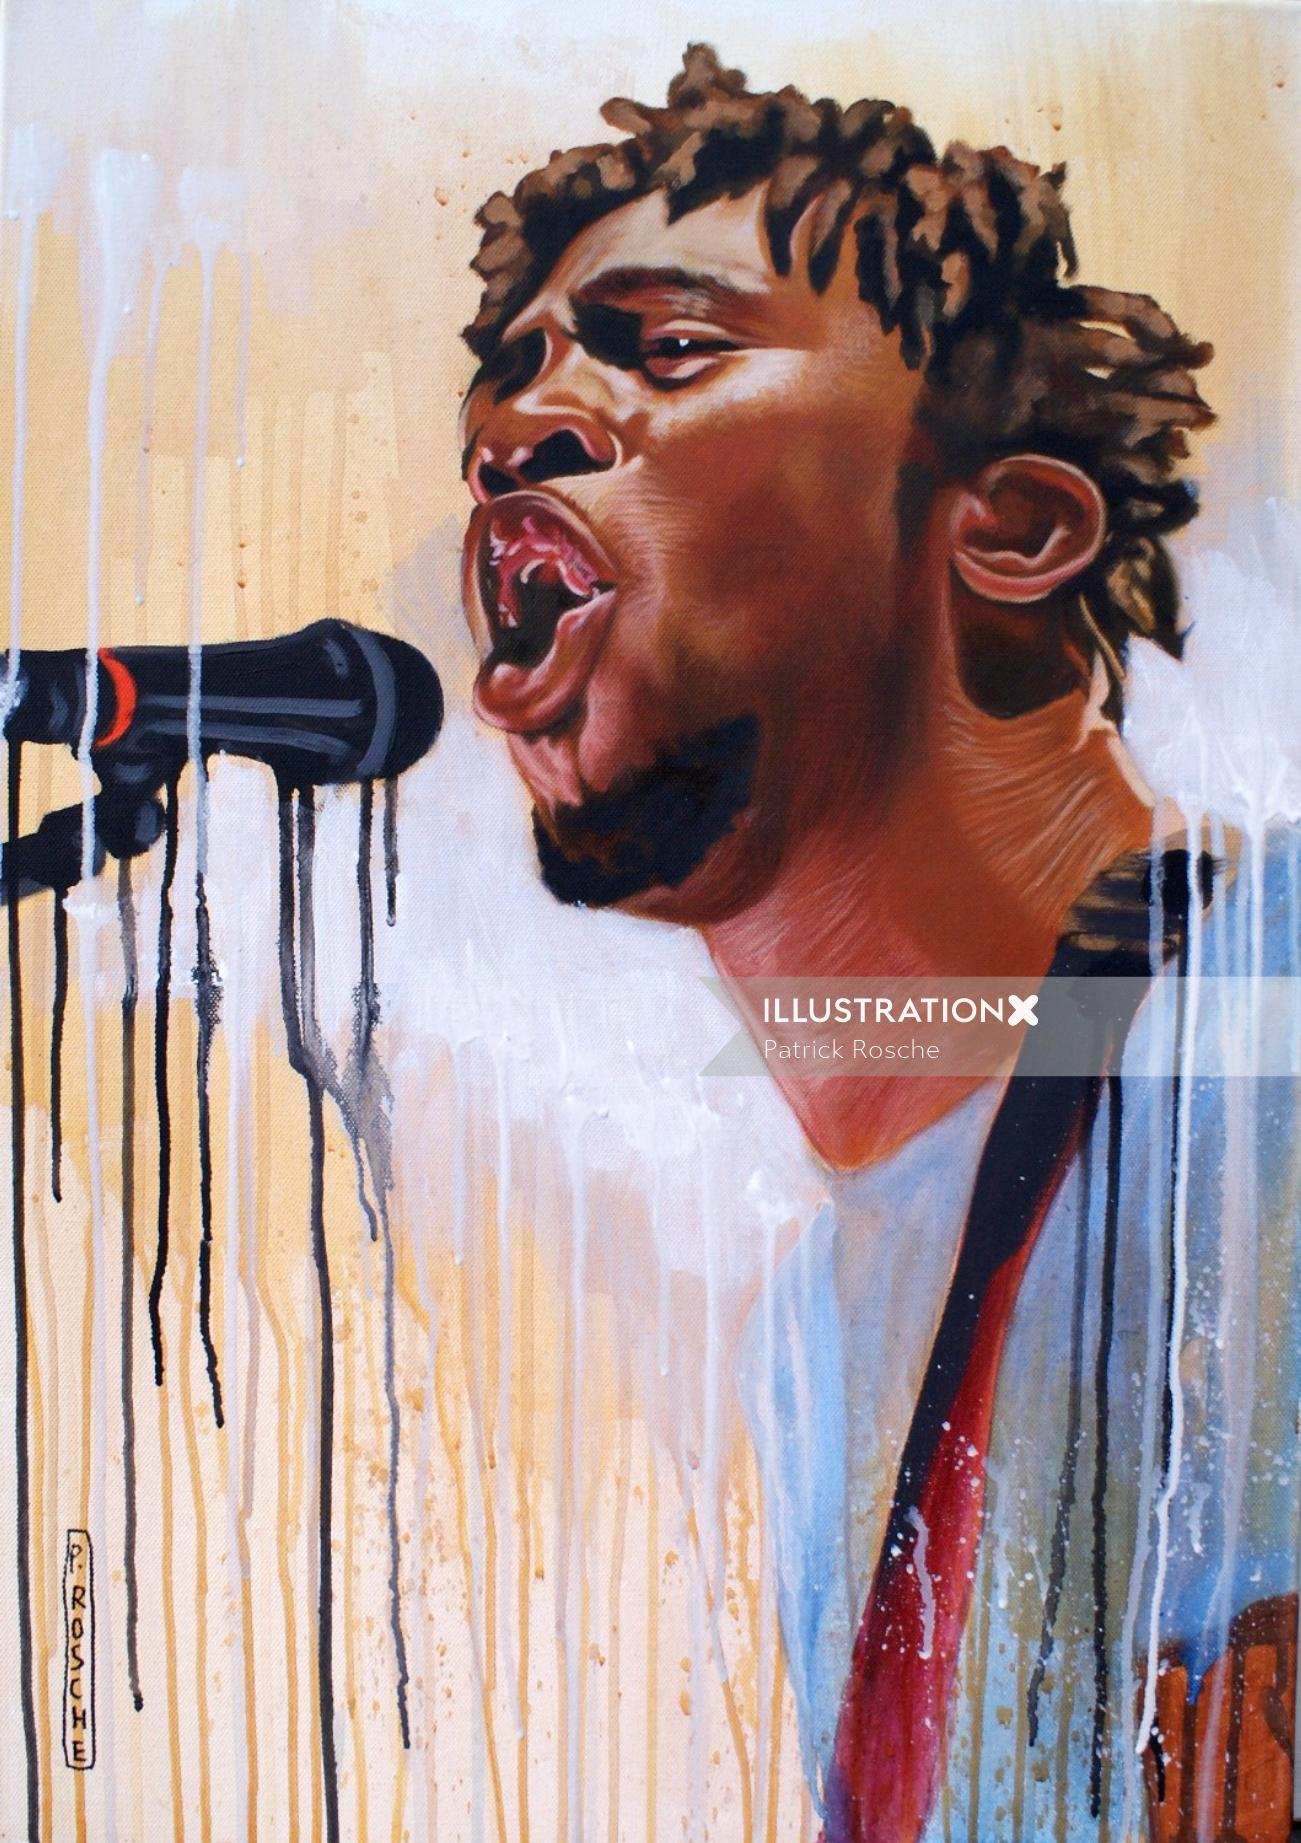 Male singer portrait illustration